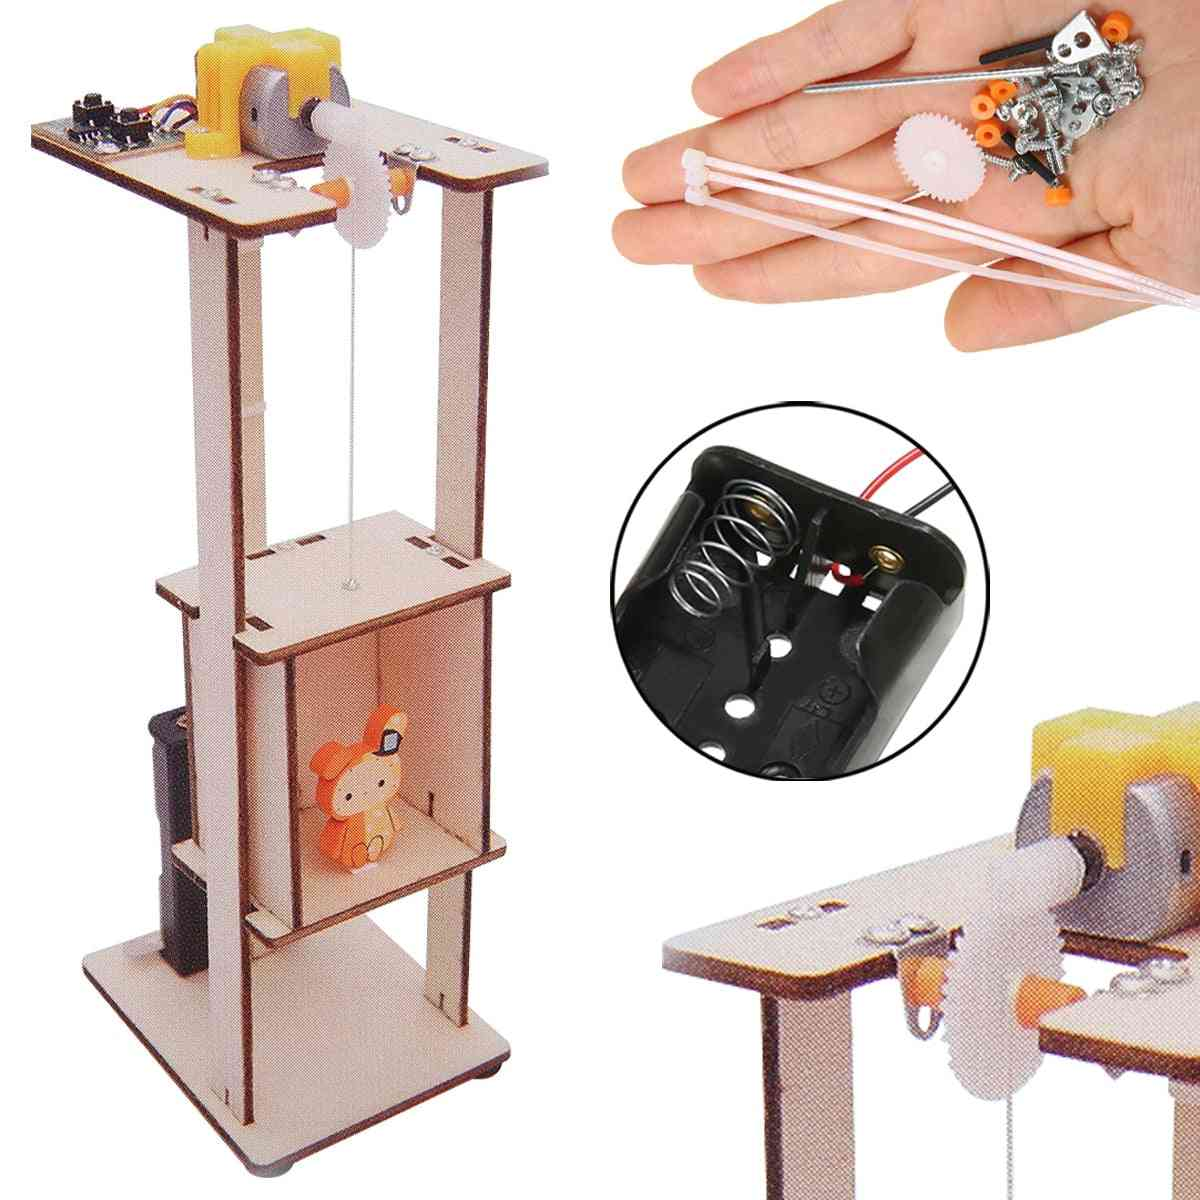 Wood Assemble Diy Electric Lift Kids Science - Experiment Material Kits Tool